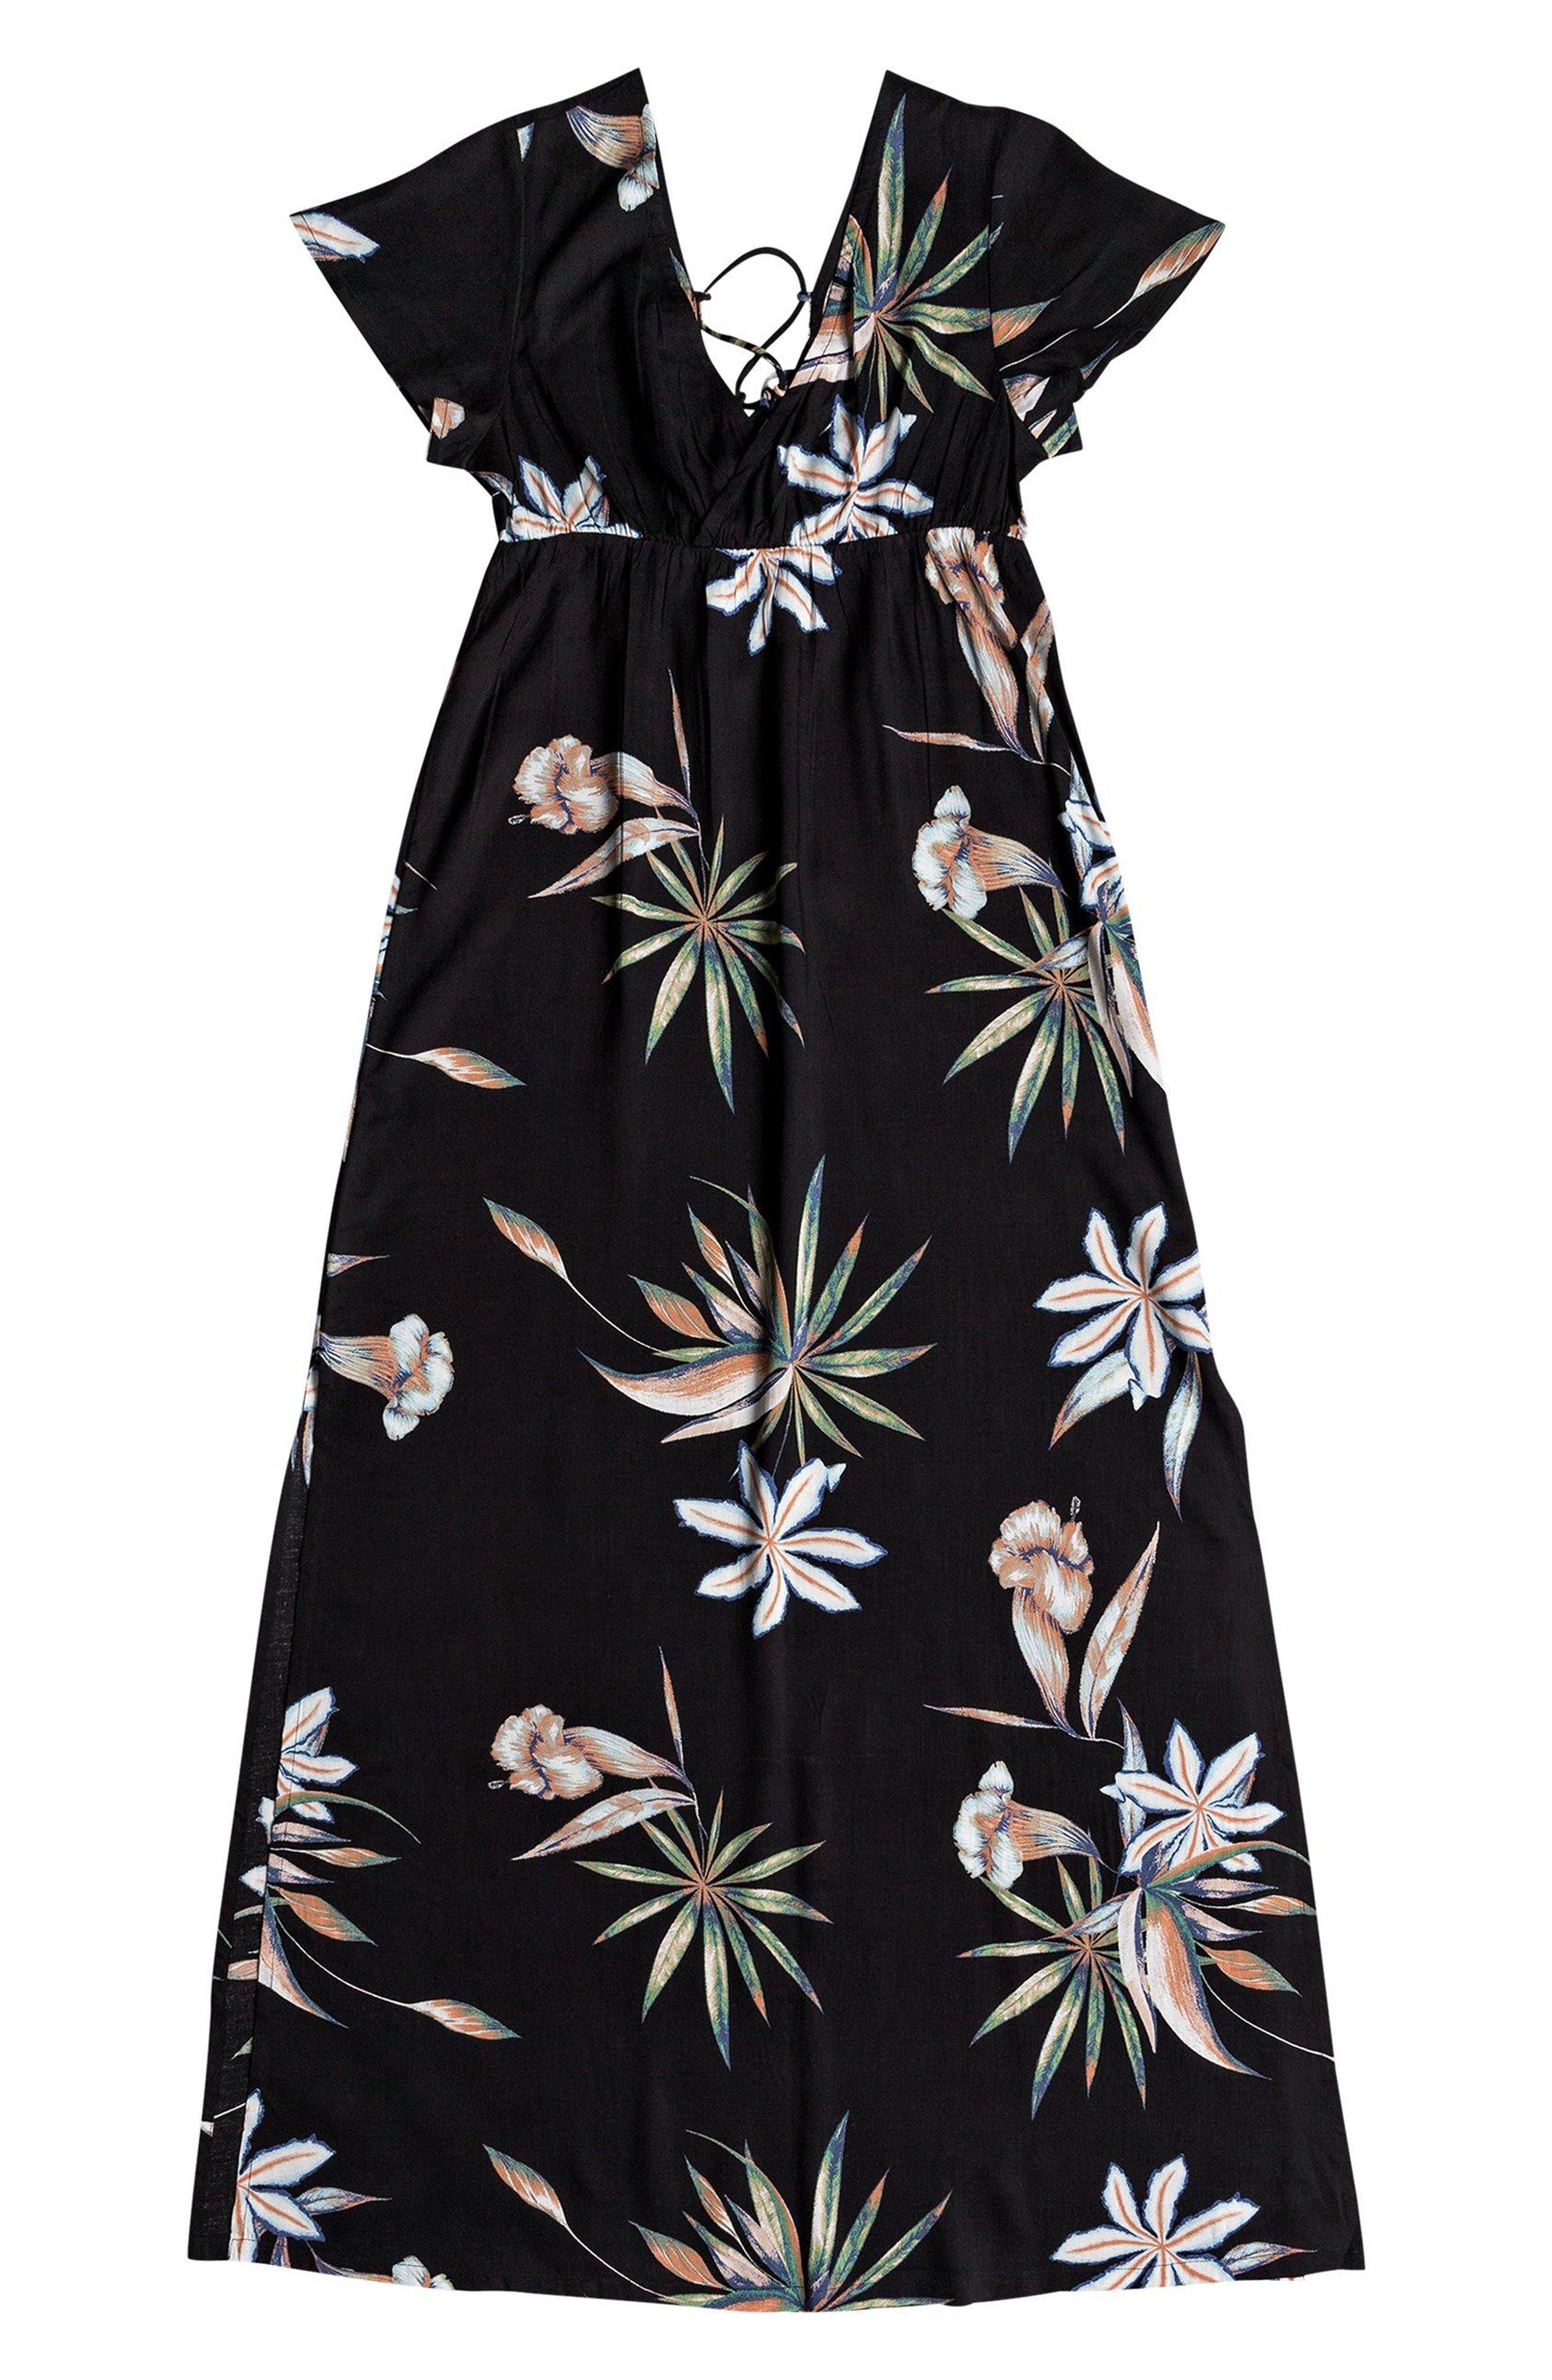 Lotus Heart Midi Dress,                             Alternate thumbnail 6, color,                             TRUE BLACK NIGHTLIGHTS